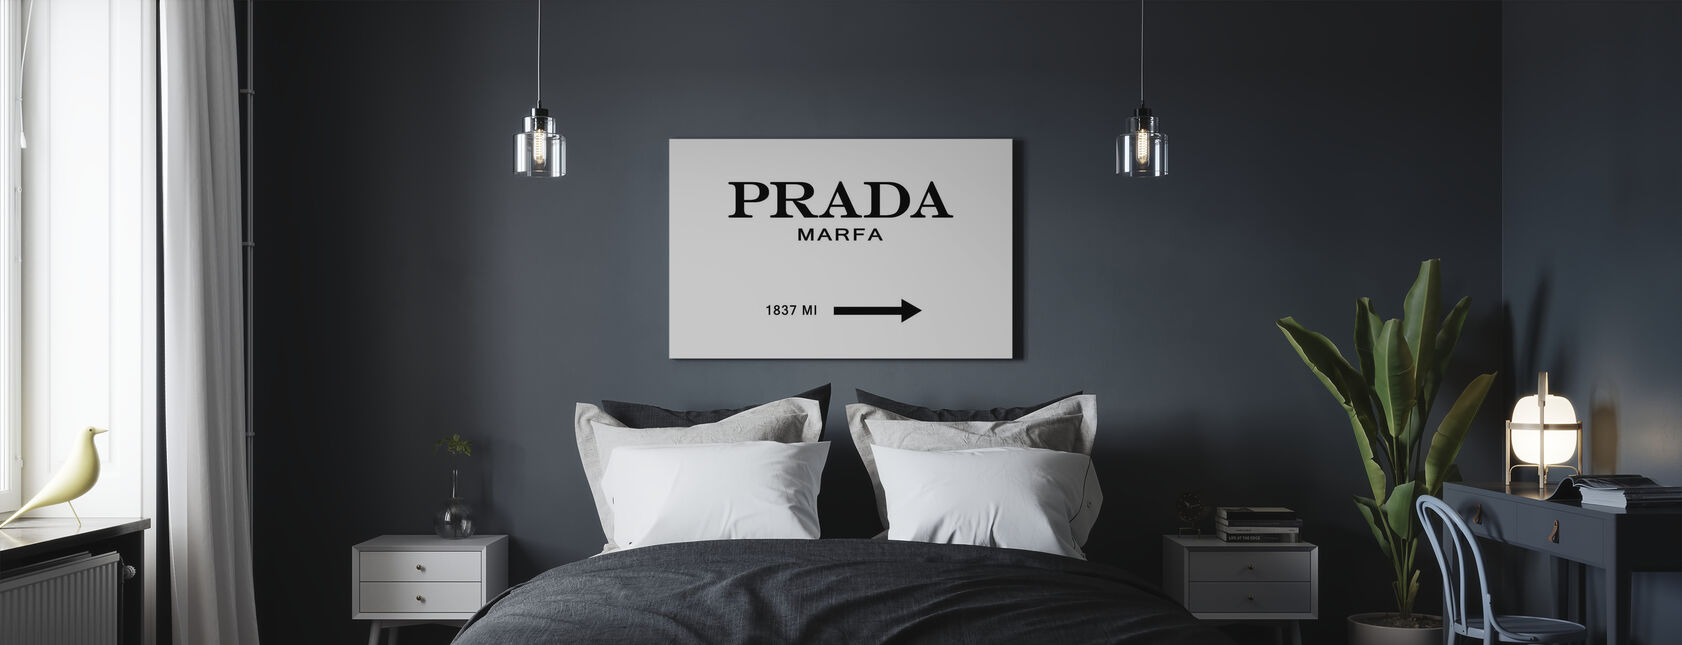 Prada Marfa - Leinwandbild - Schlafzimmer